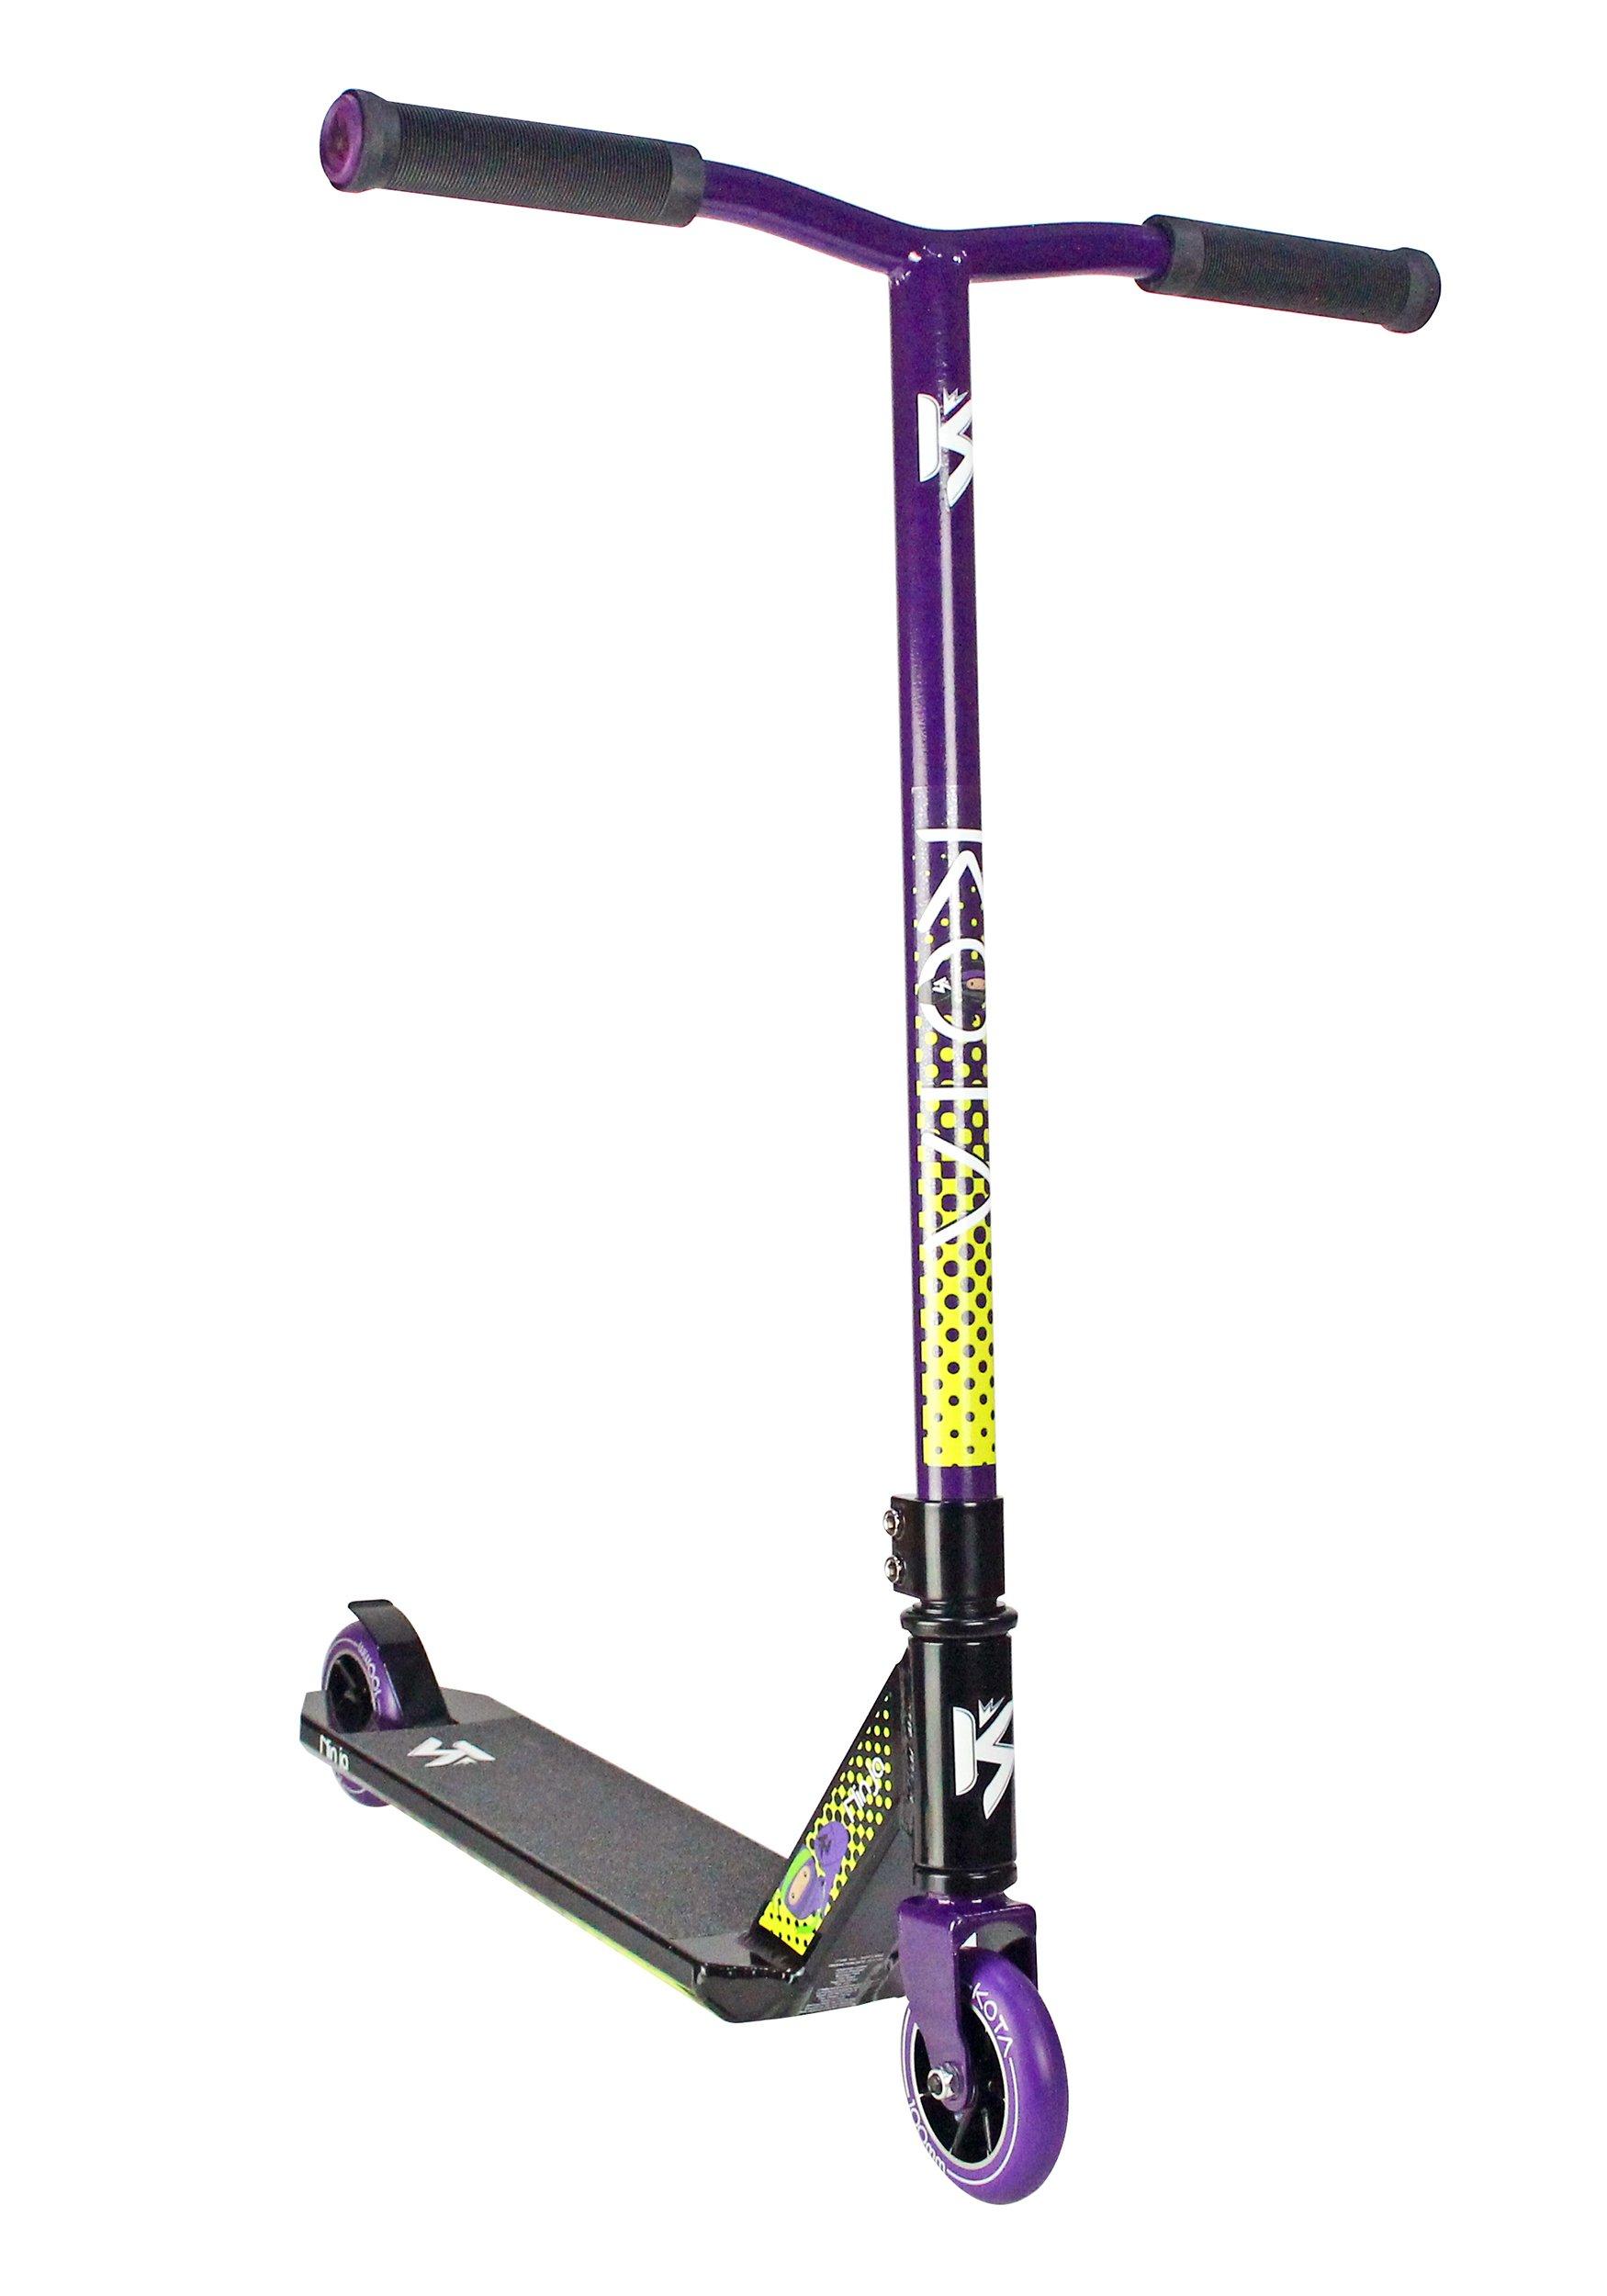 Kota Ninja Pro Scooter (Black/Purple)